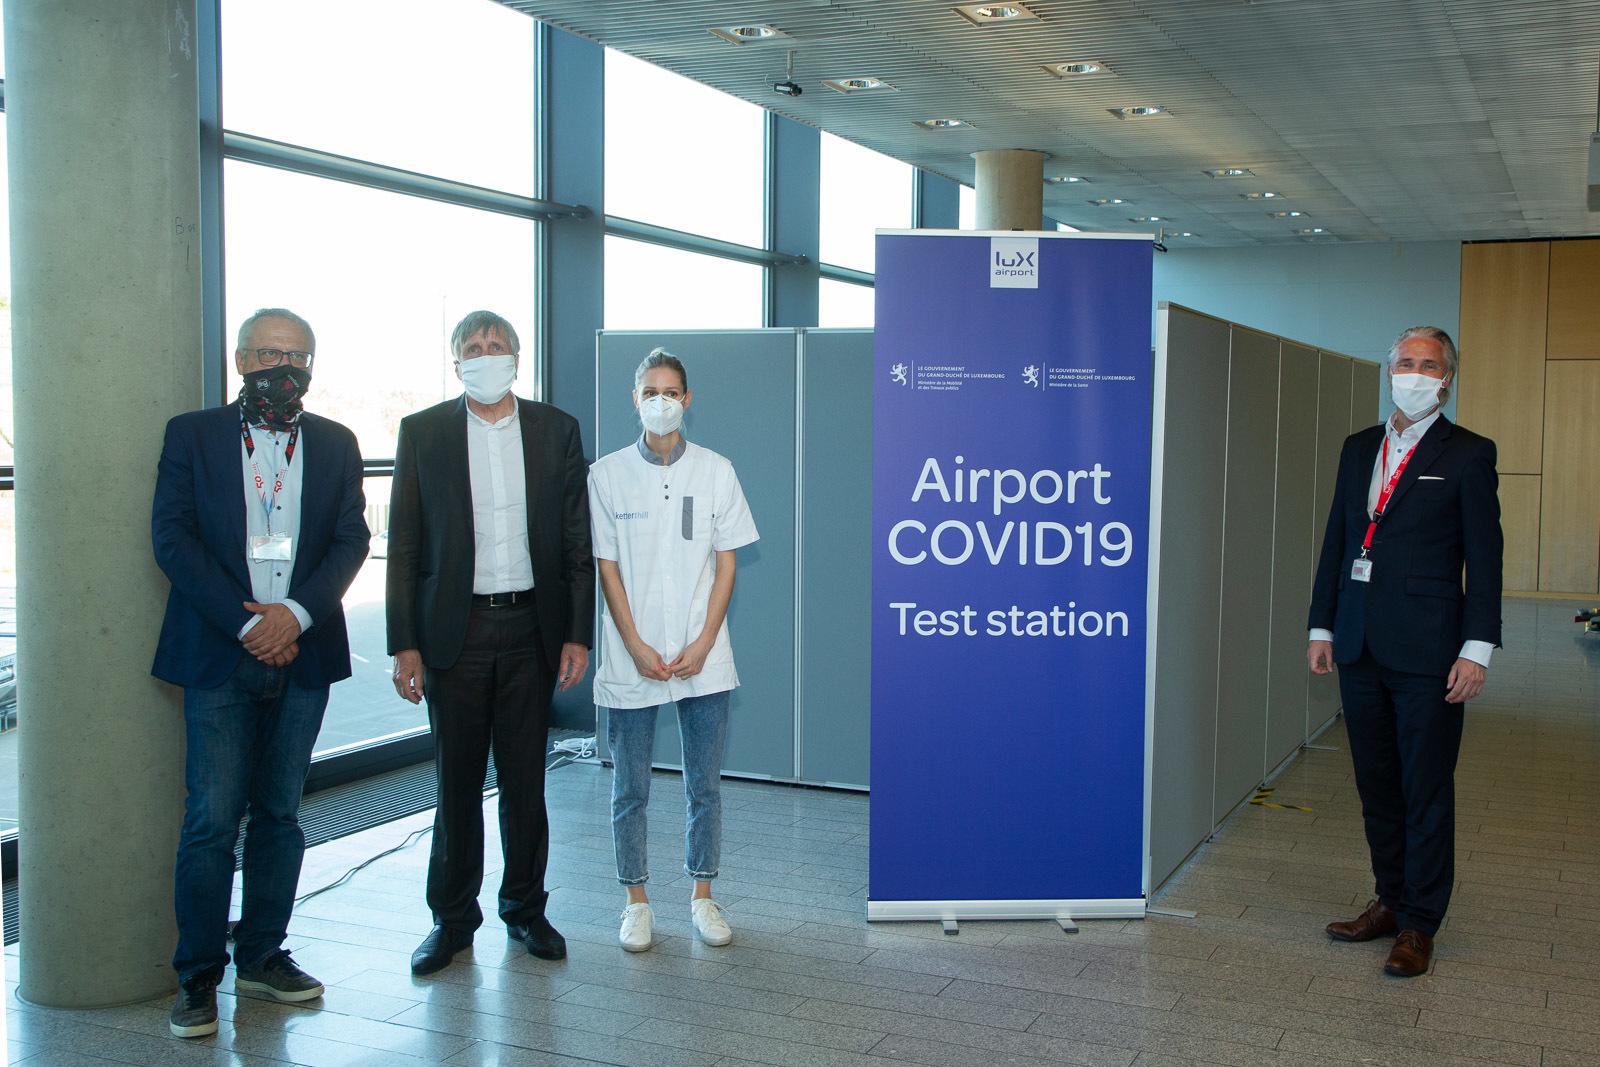 Projet Pilote De Testing Covid 19 A L Aeroport De Luxembourg Gouvernement Lu Le Gouvernement Luxembourgeois